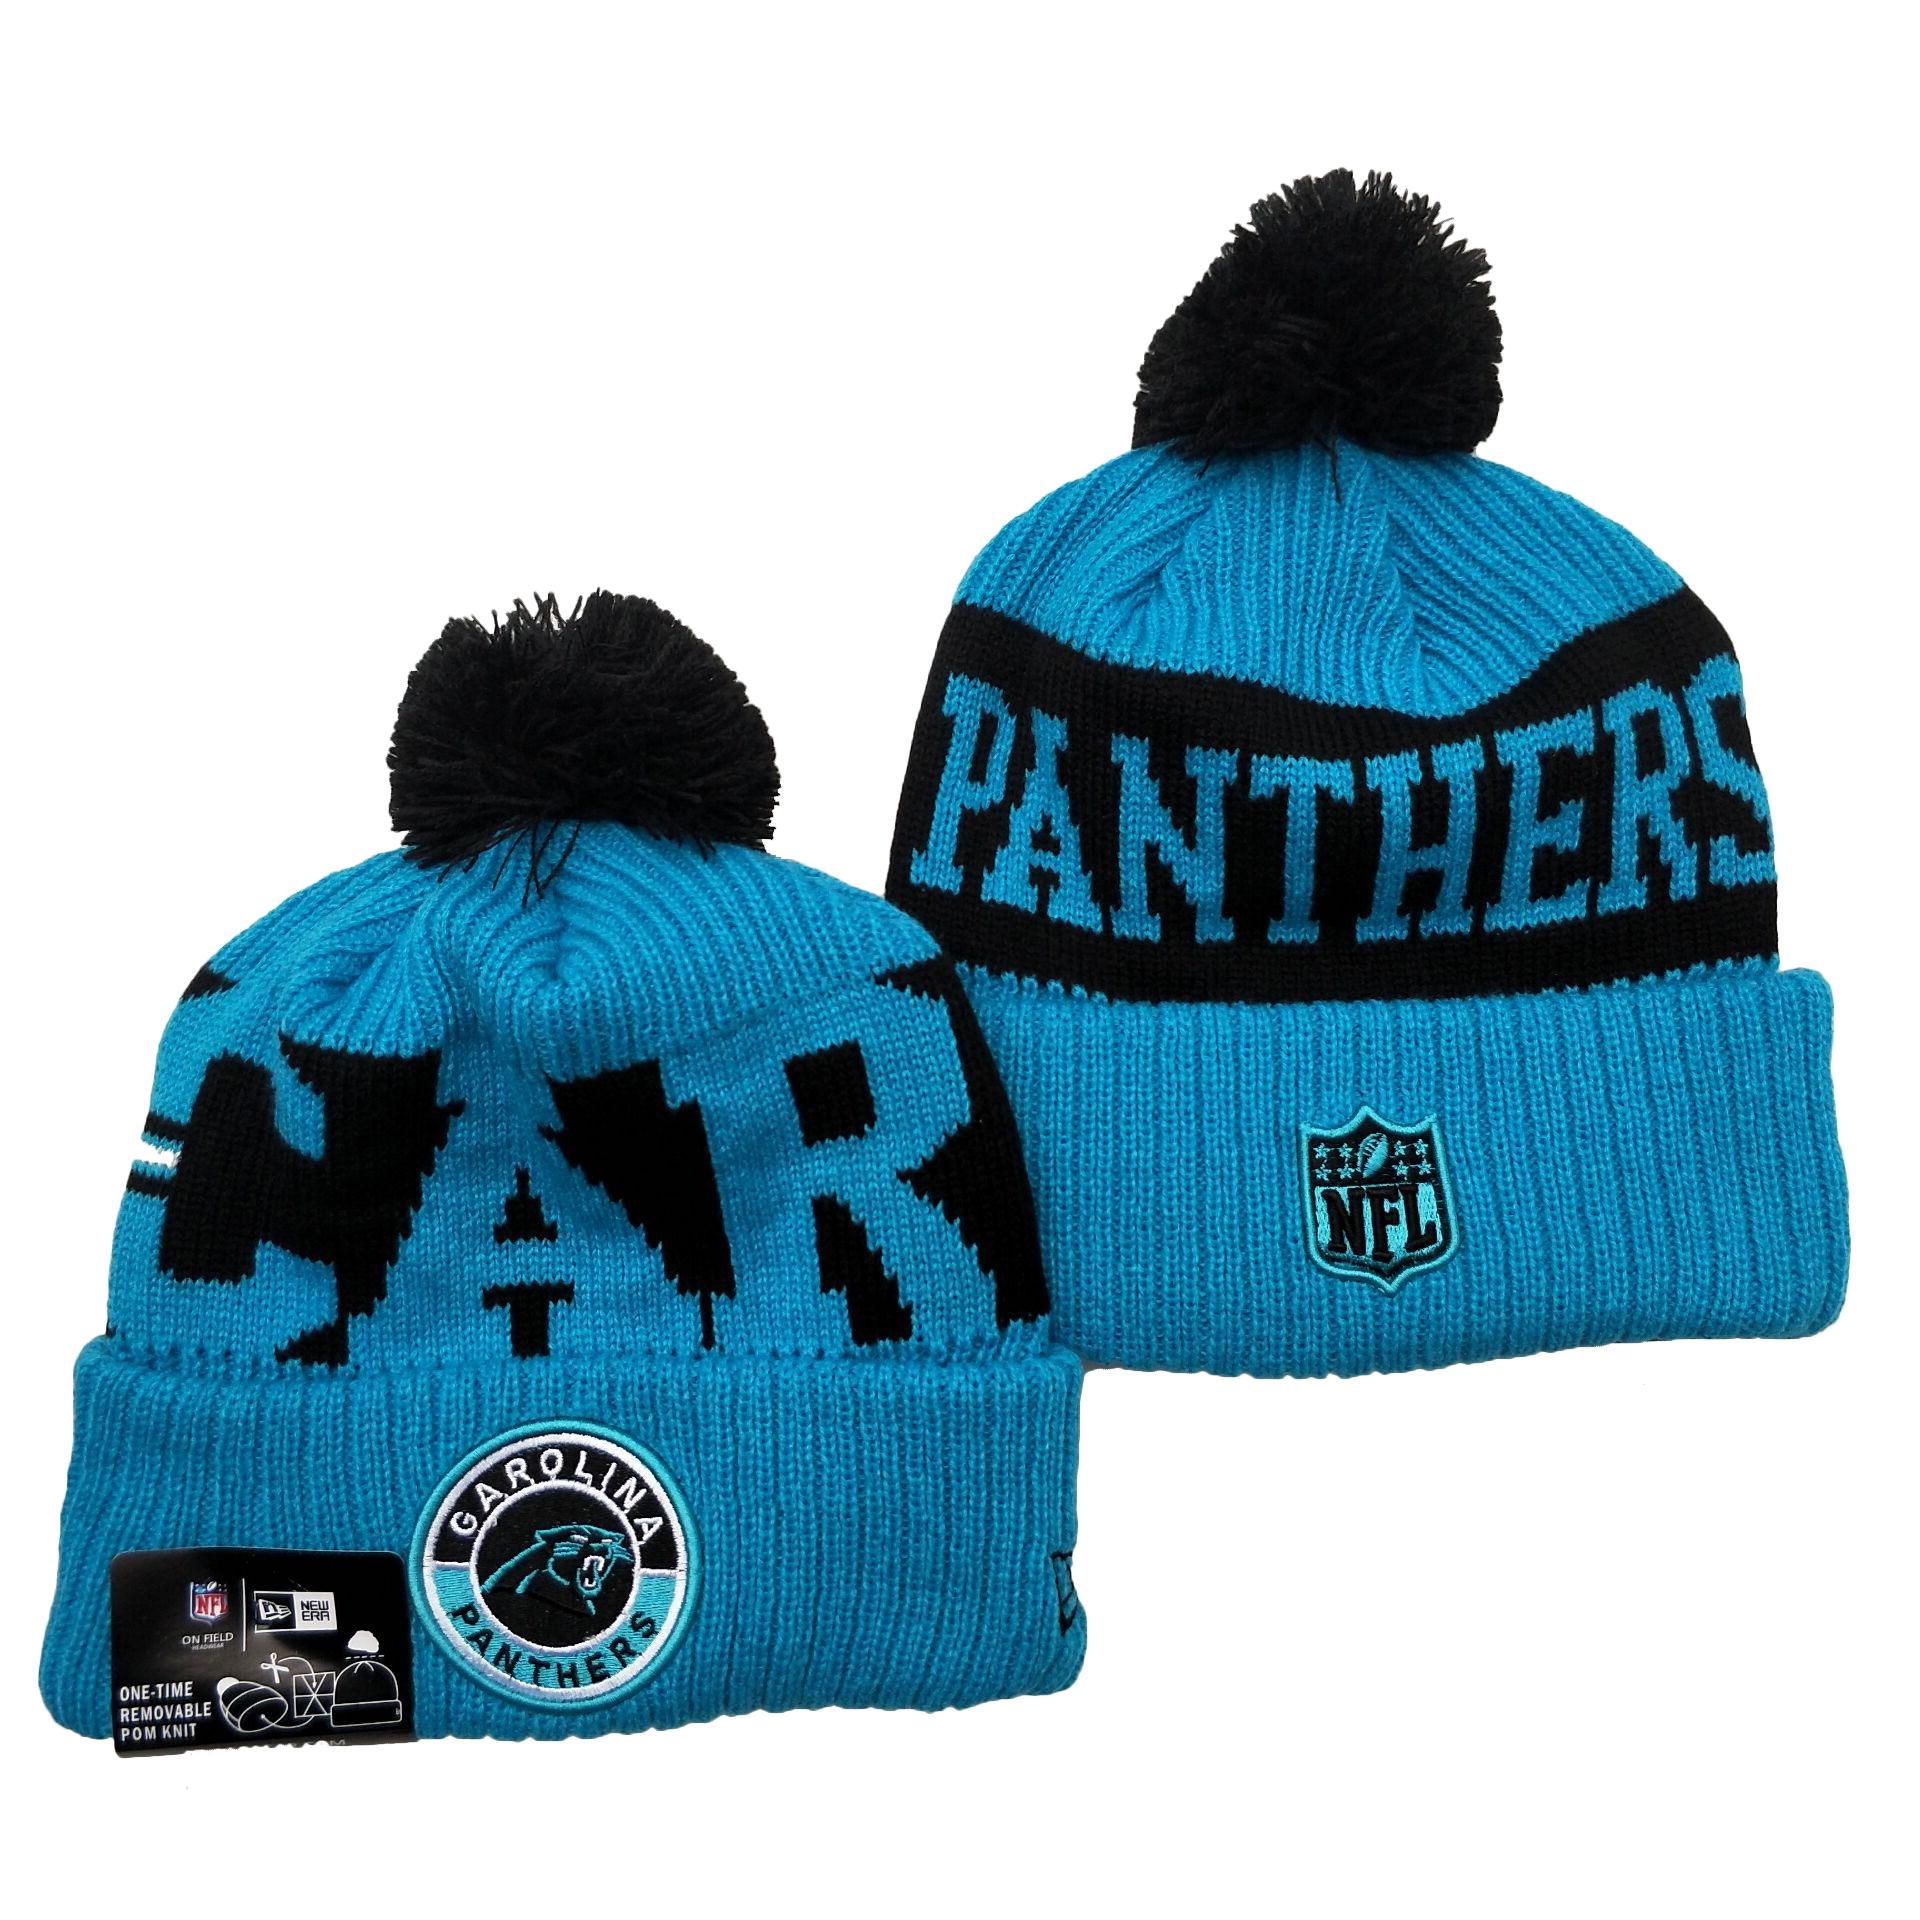 Panthers Team Logo Blue 2020 NFL Sideline Pom Cuffed Knit Hat YD